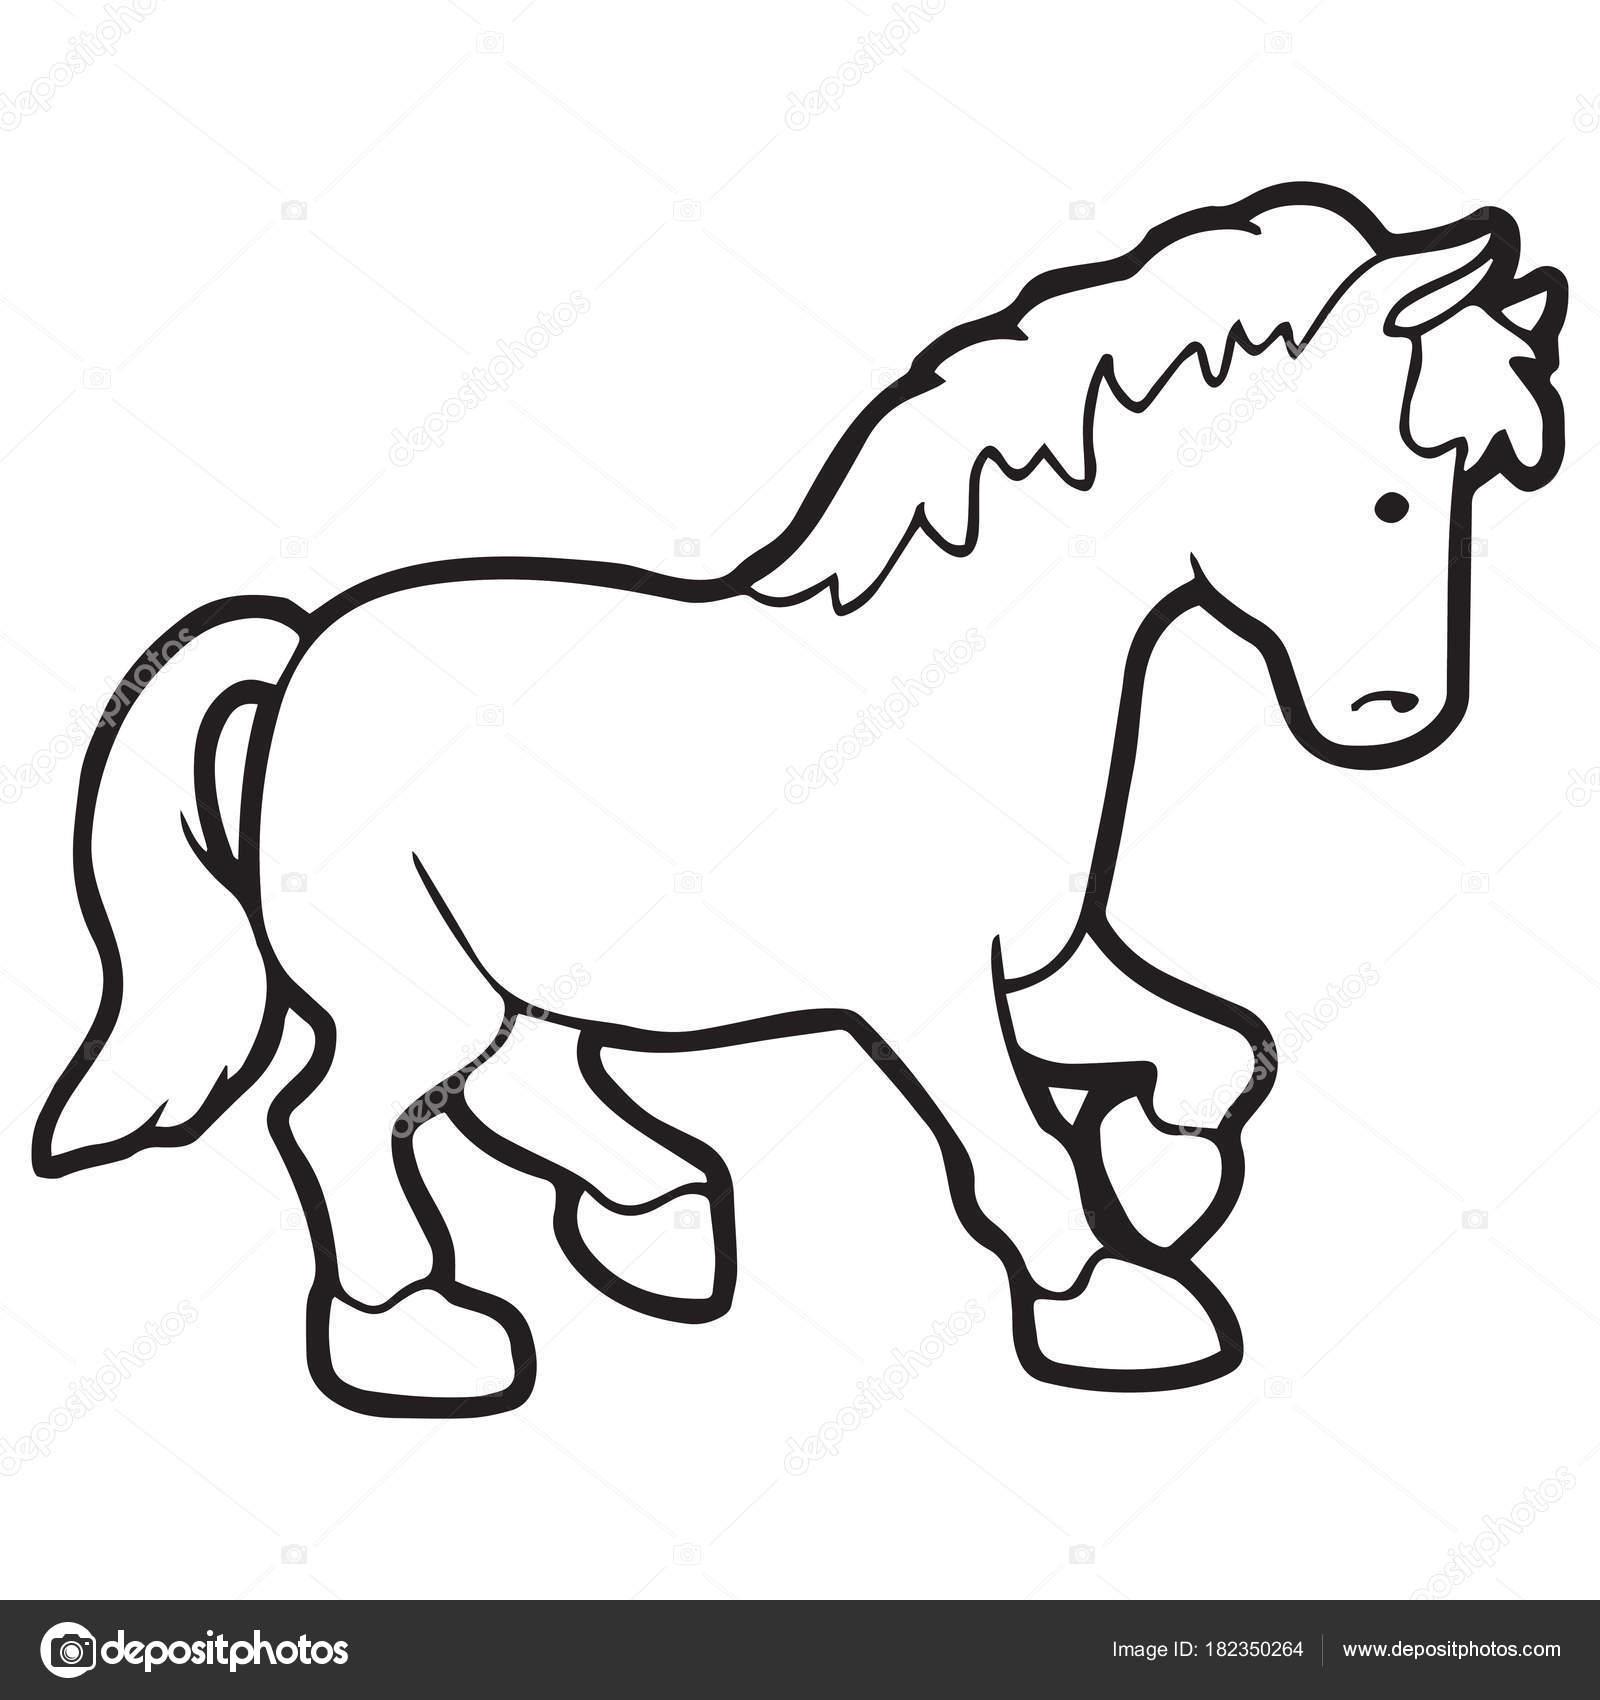 Cute Cartoon Horse White Background Childrens Prints Shirt Color Book Stock Vector C Foxynguyen 182350264